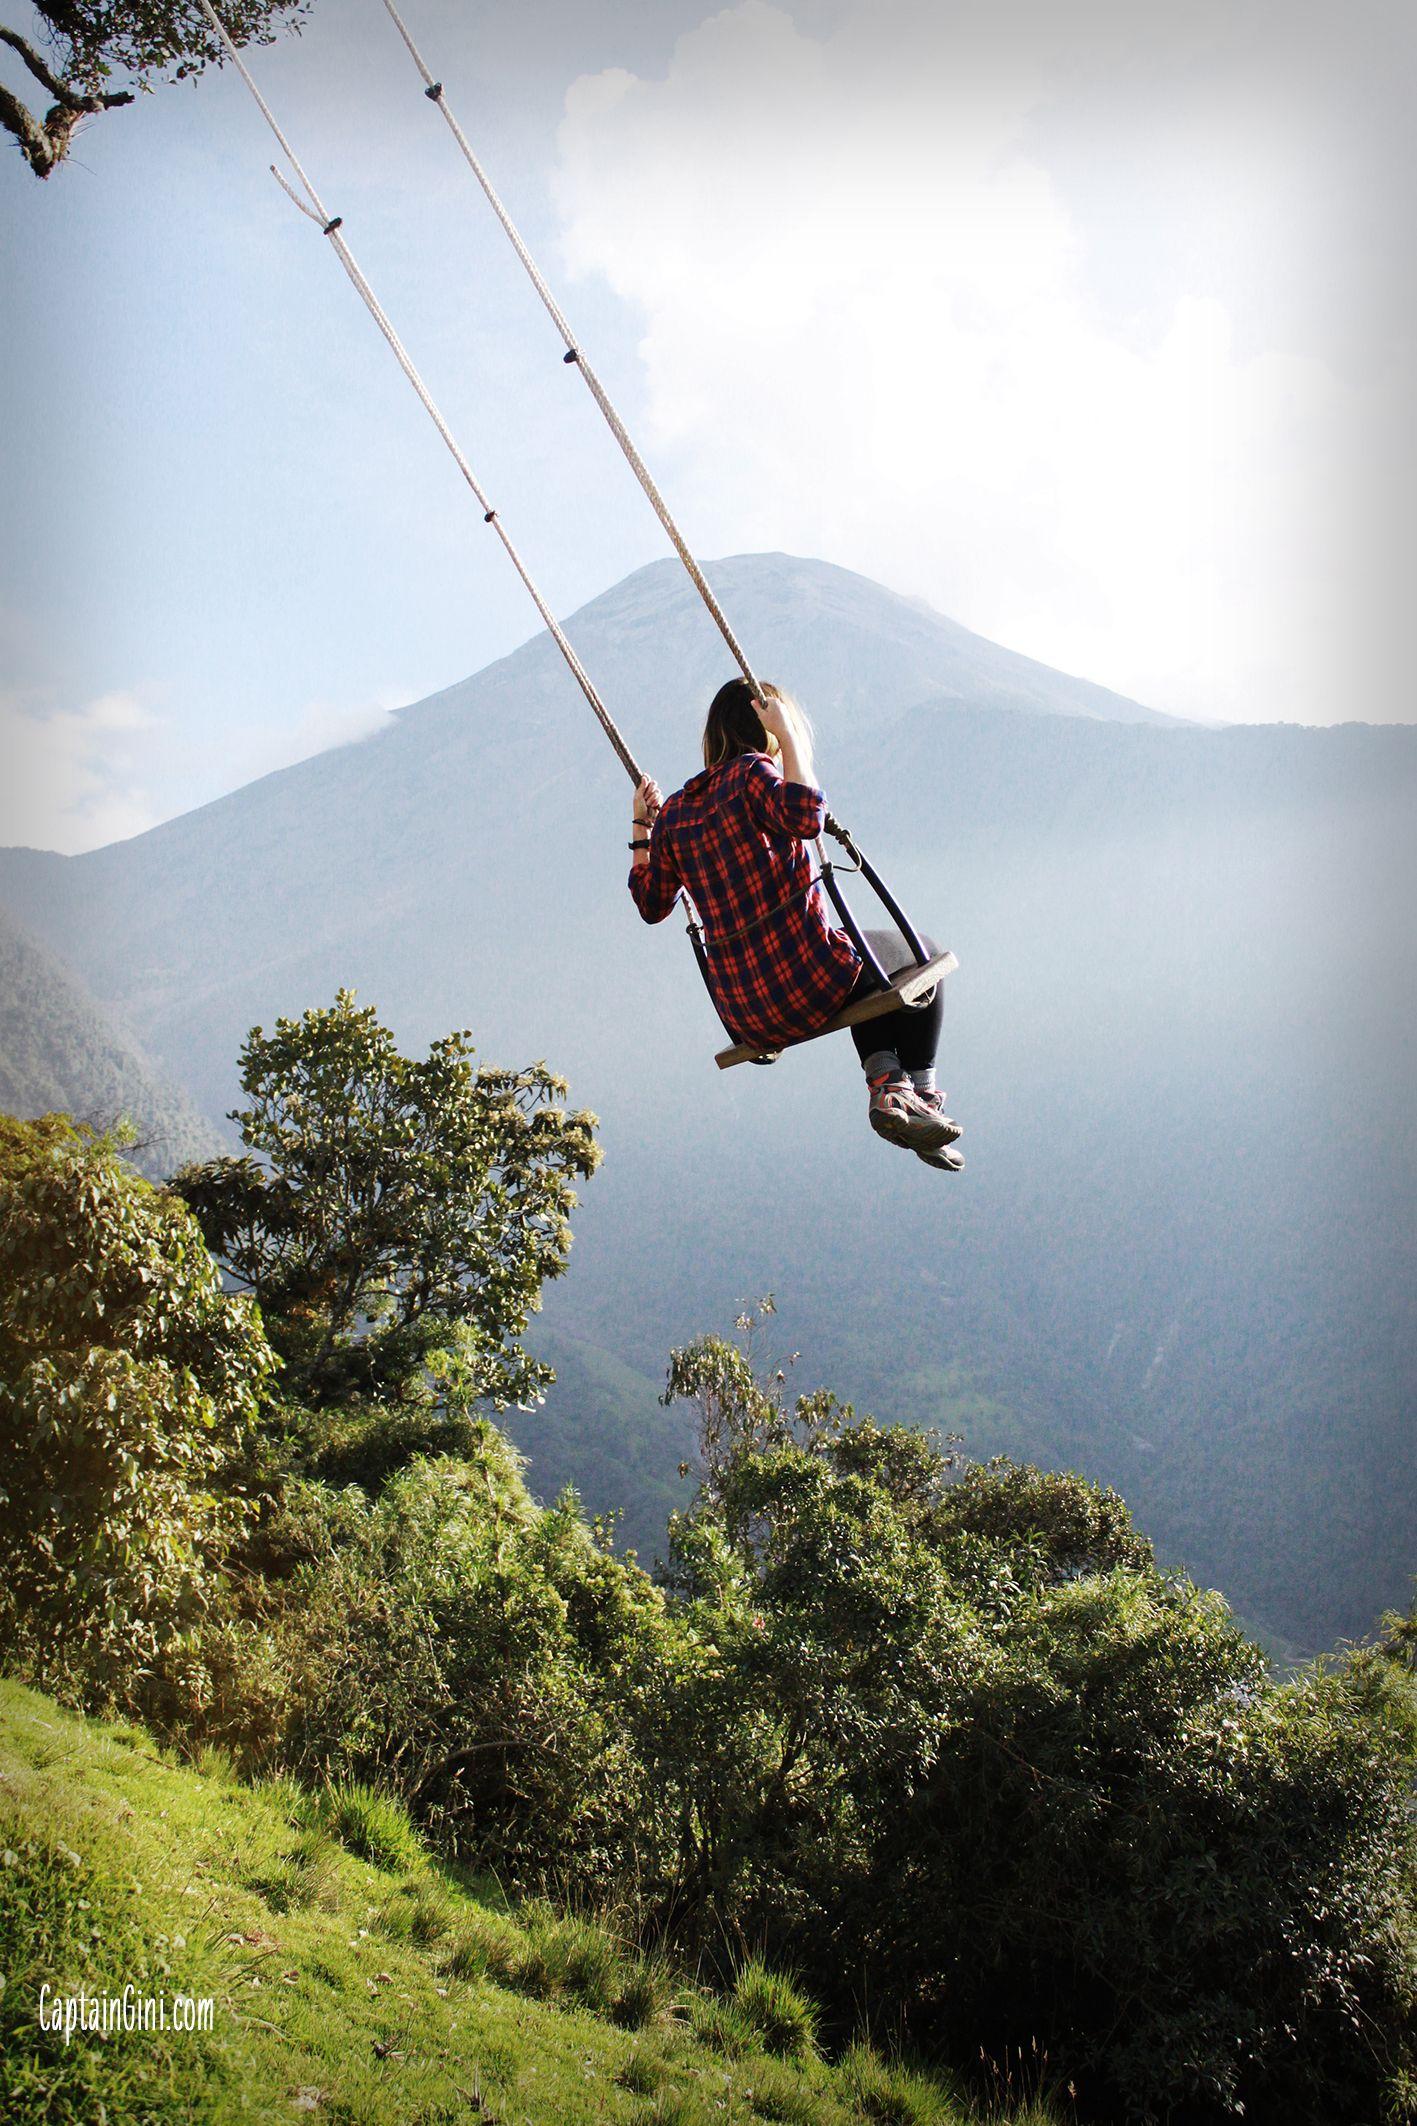 The swing at the end of the world - Banos - Equateur. Tous les articles sur www.captaingini.com